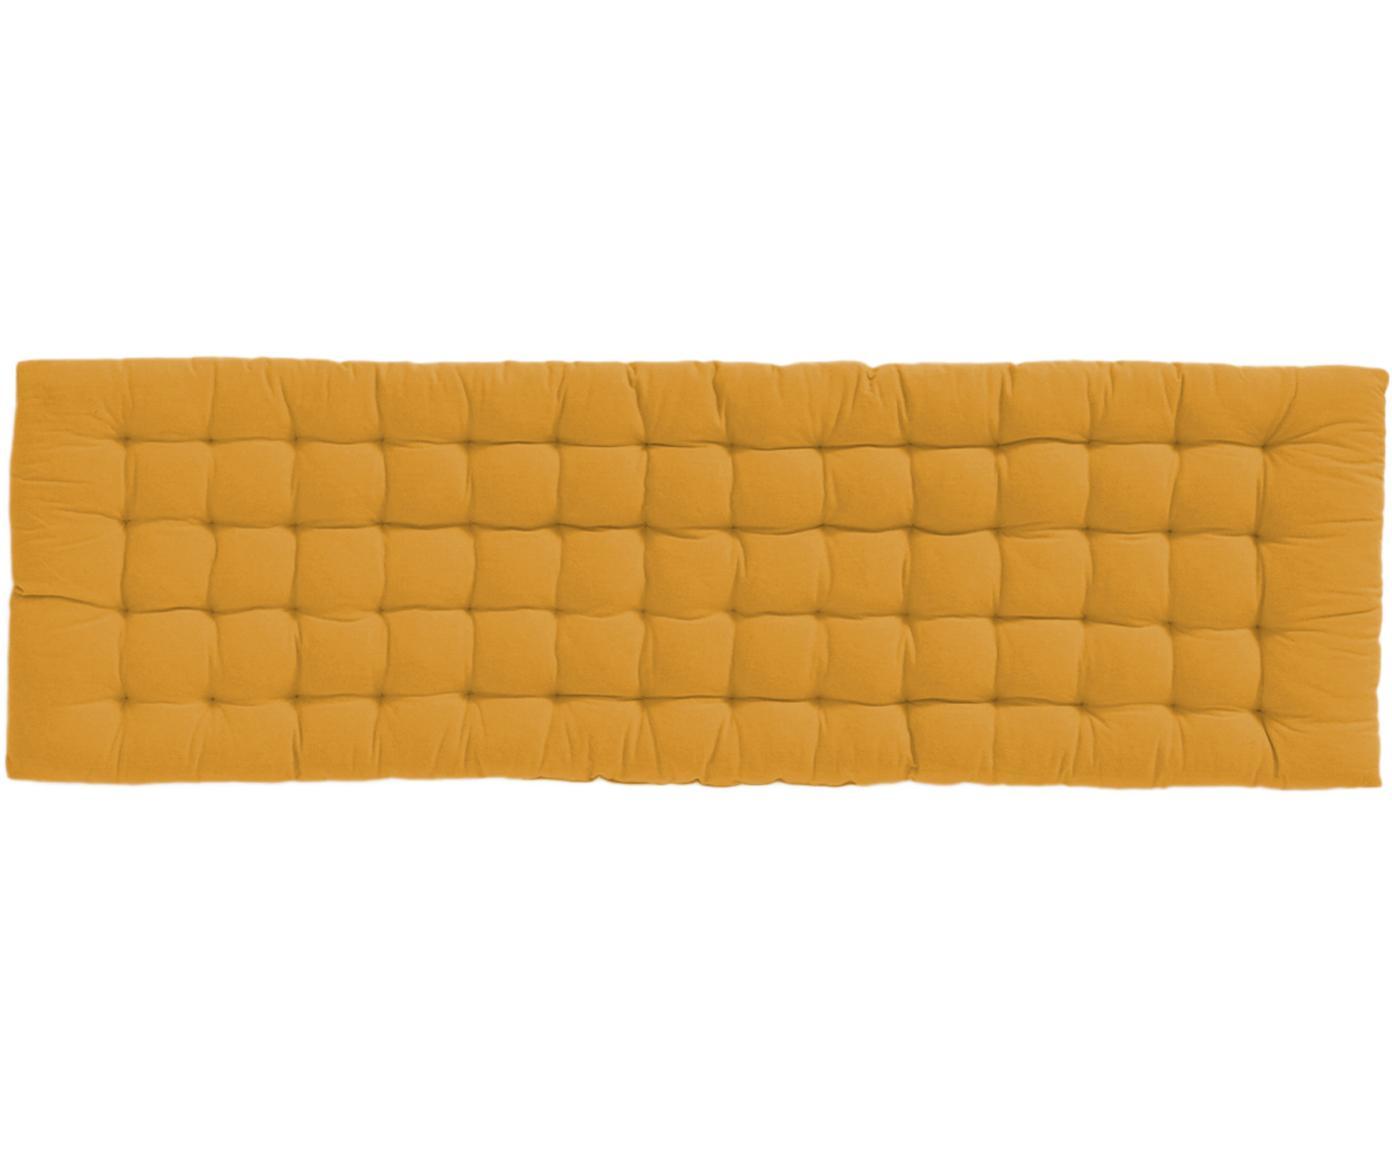 Cuscino sedia Gavema, Giallo senape, Larg. 40 x Lung. 120 cm